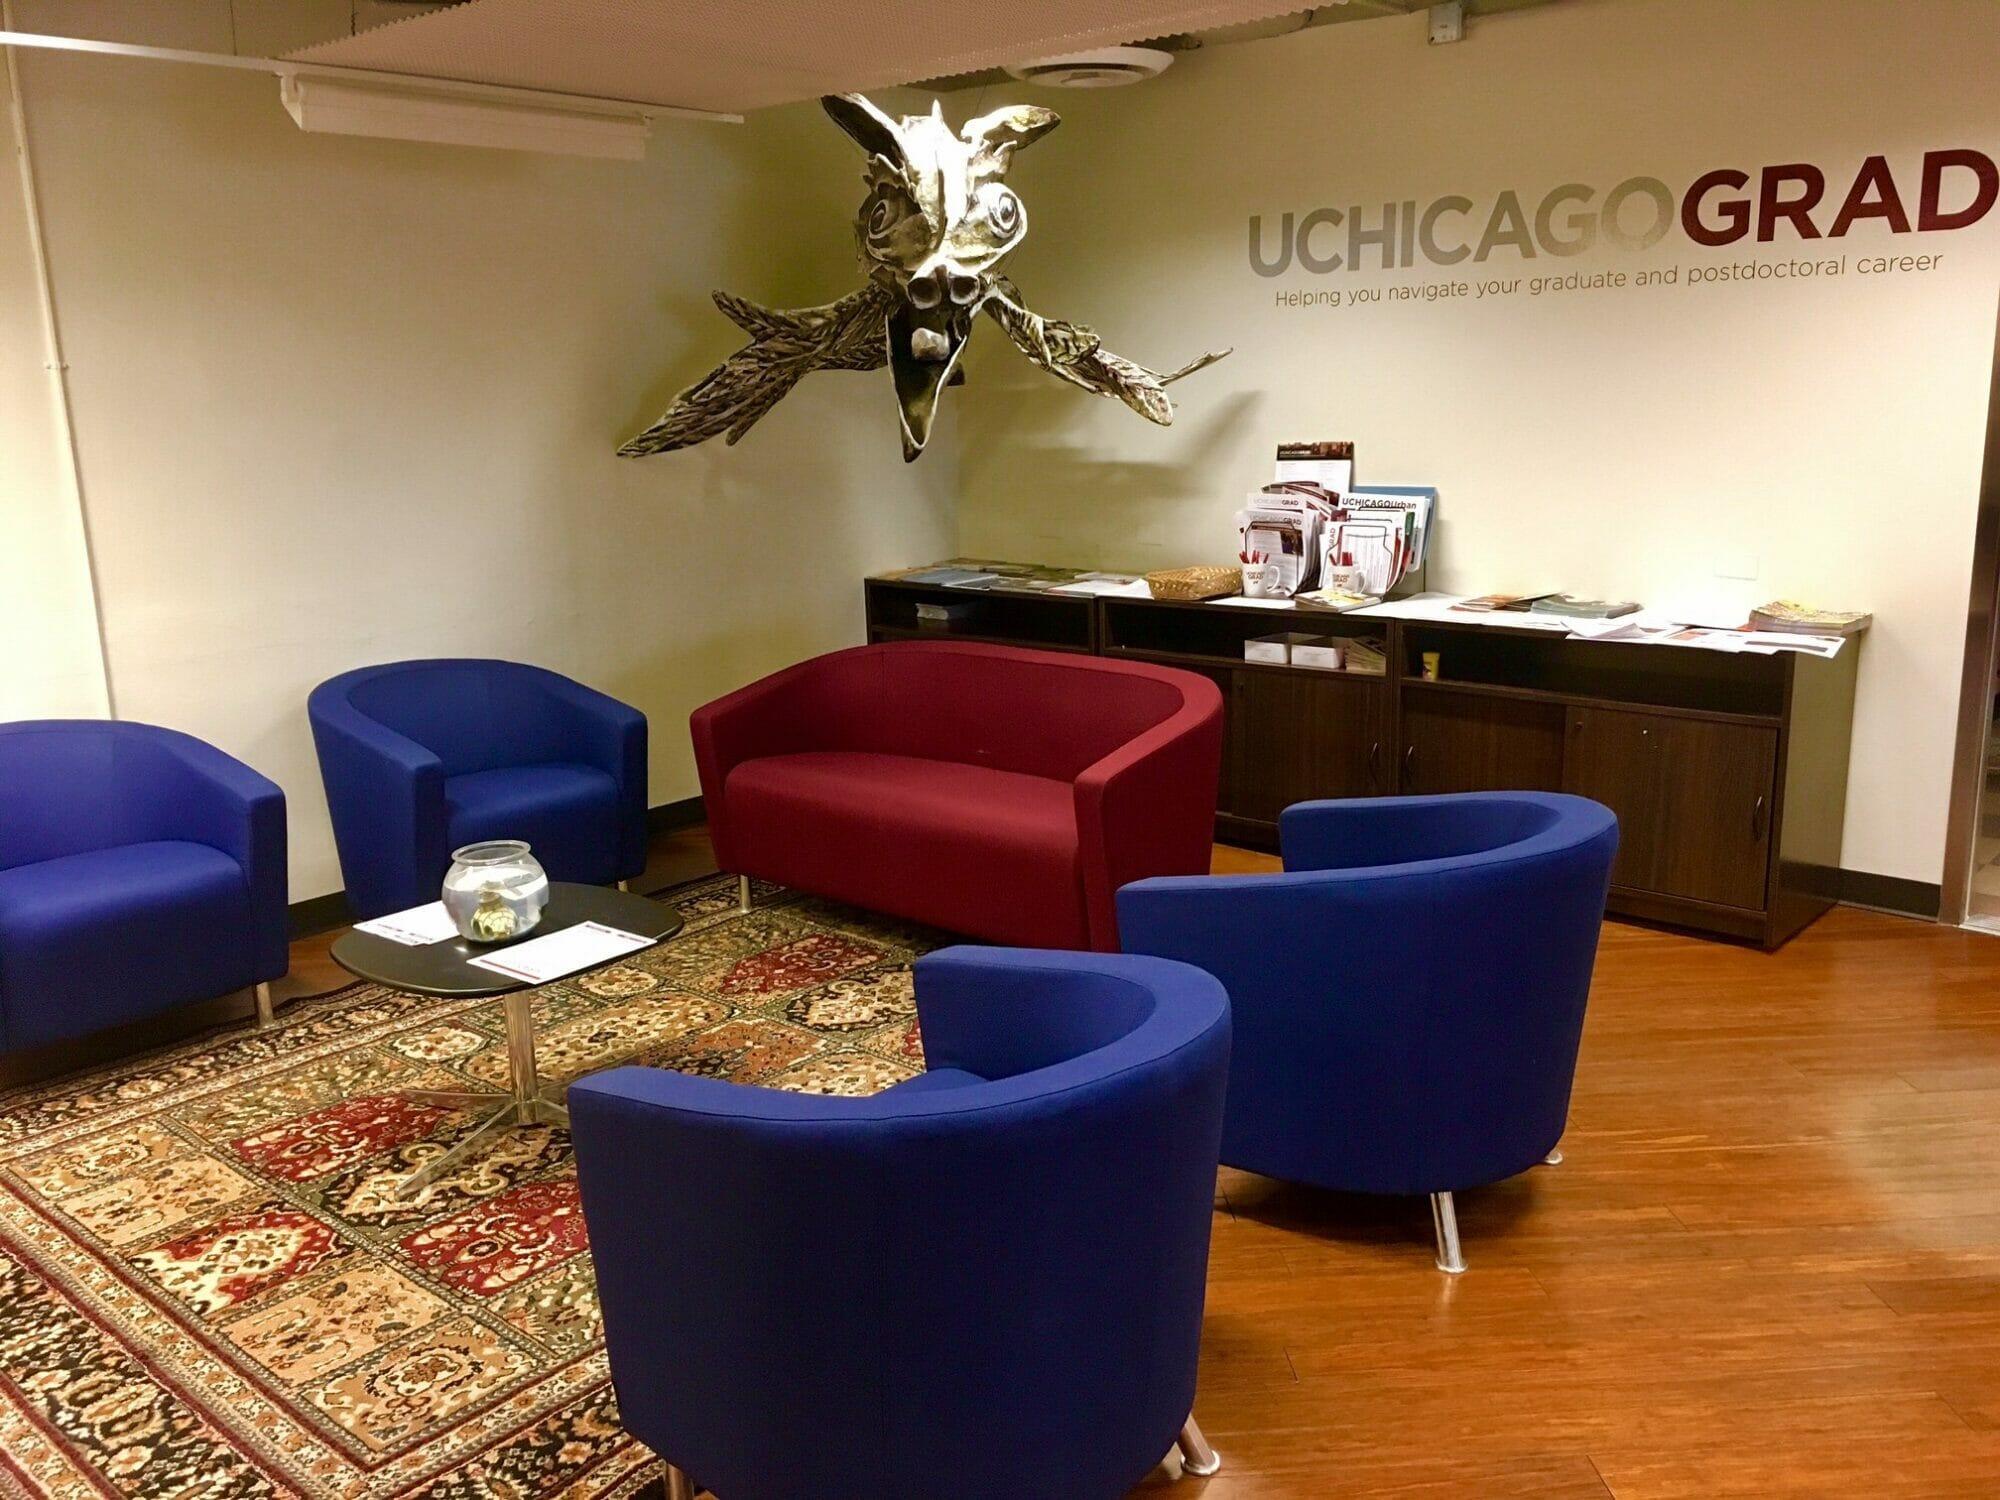 UChicago GRAD HQ space.